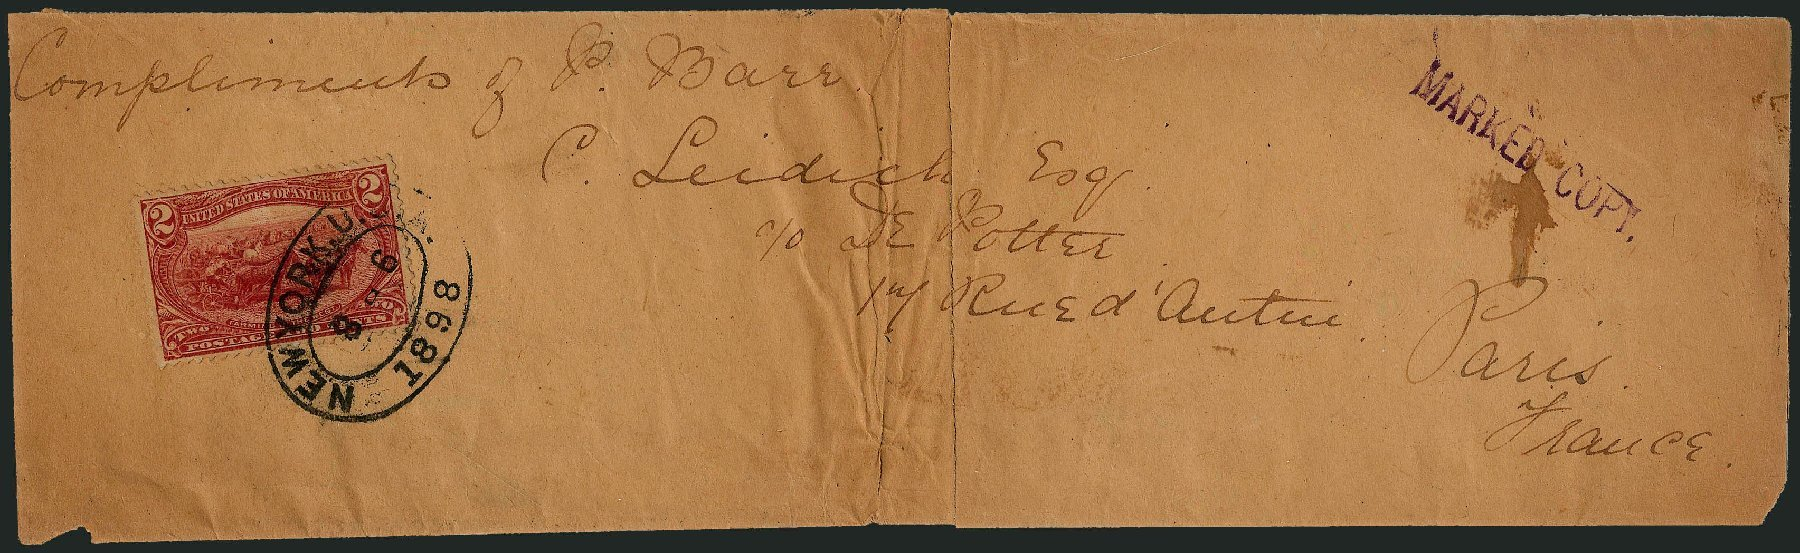 US Stamp Value Scott Catalogue 286: 2c 1898 Trans Mississippi Exposition. Robert Siegel Auction Galleries, Nov 2013, Sale 1056, Lot 390